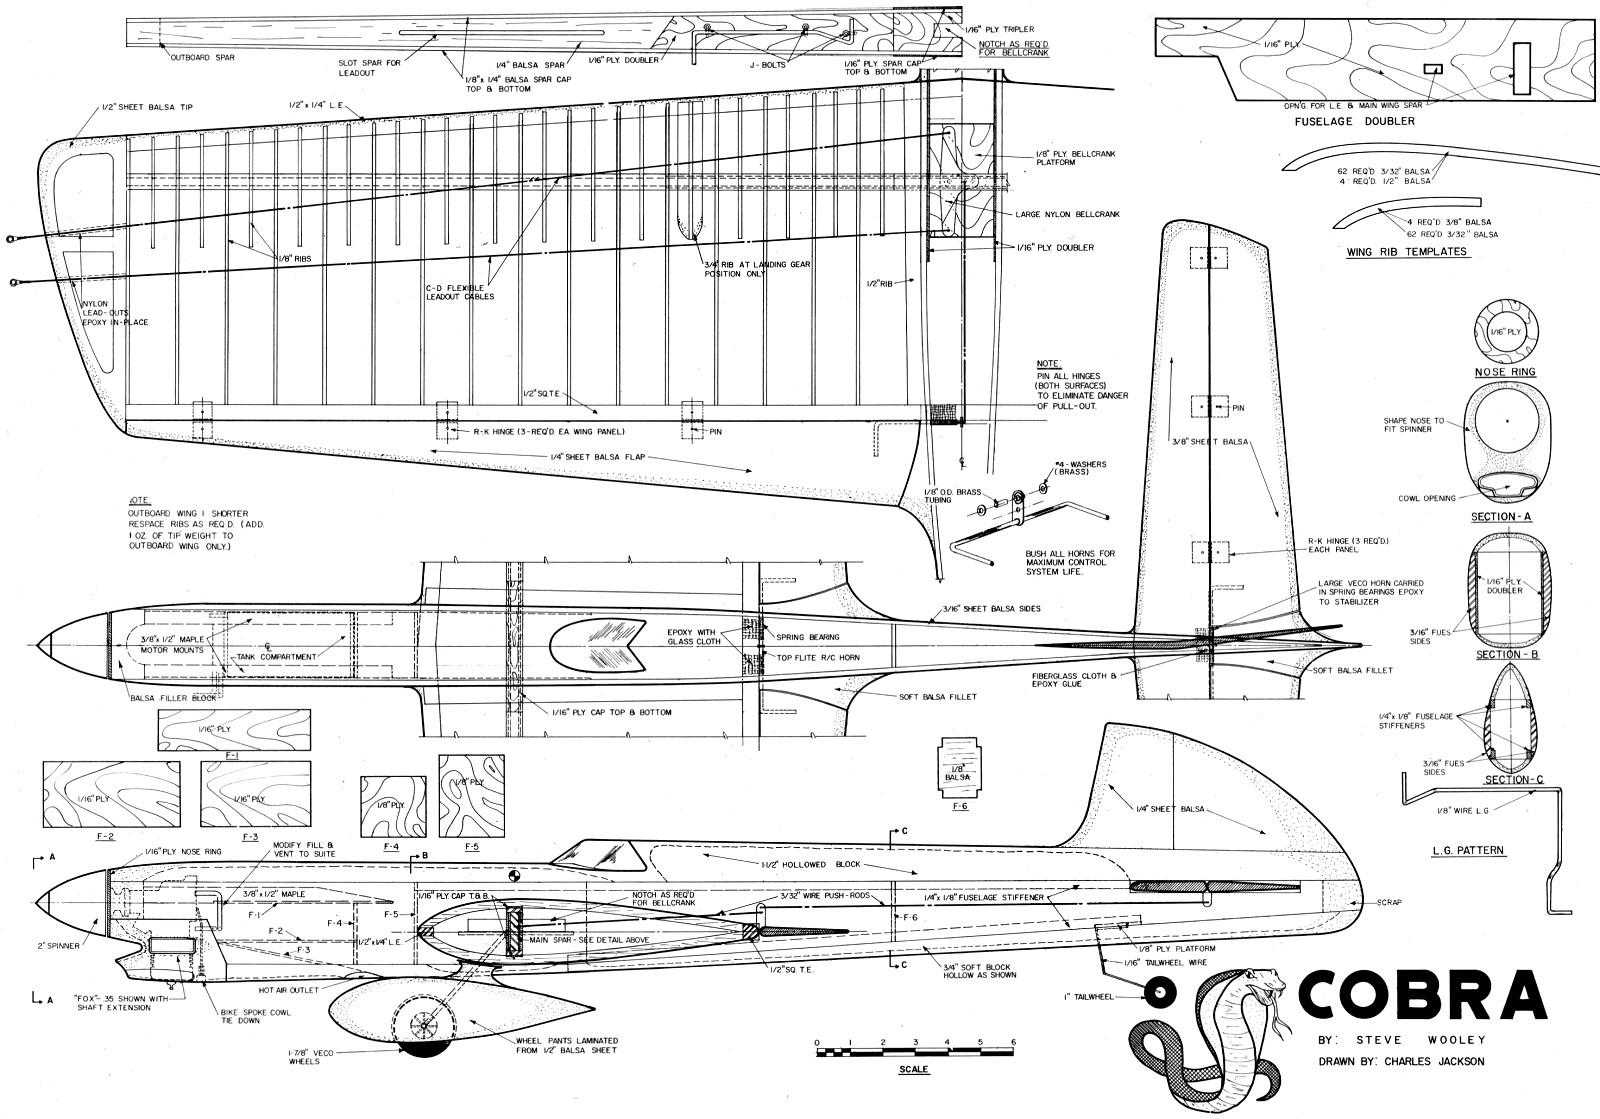 Cobra February 1971 American Aircraft Modeler Airplanes